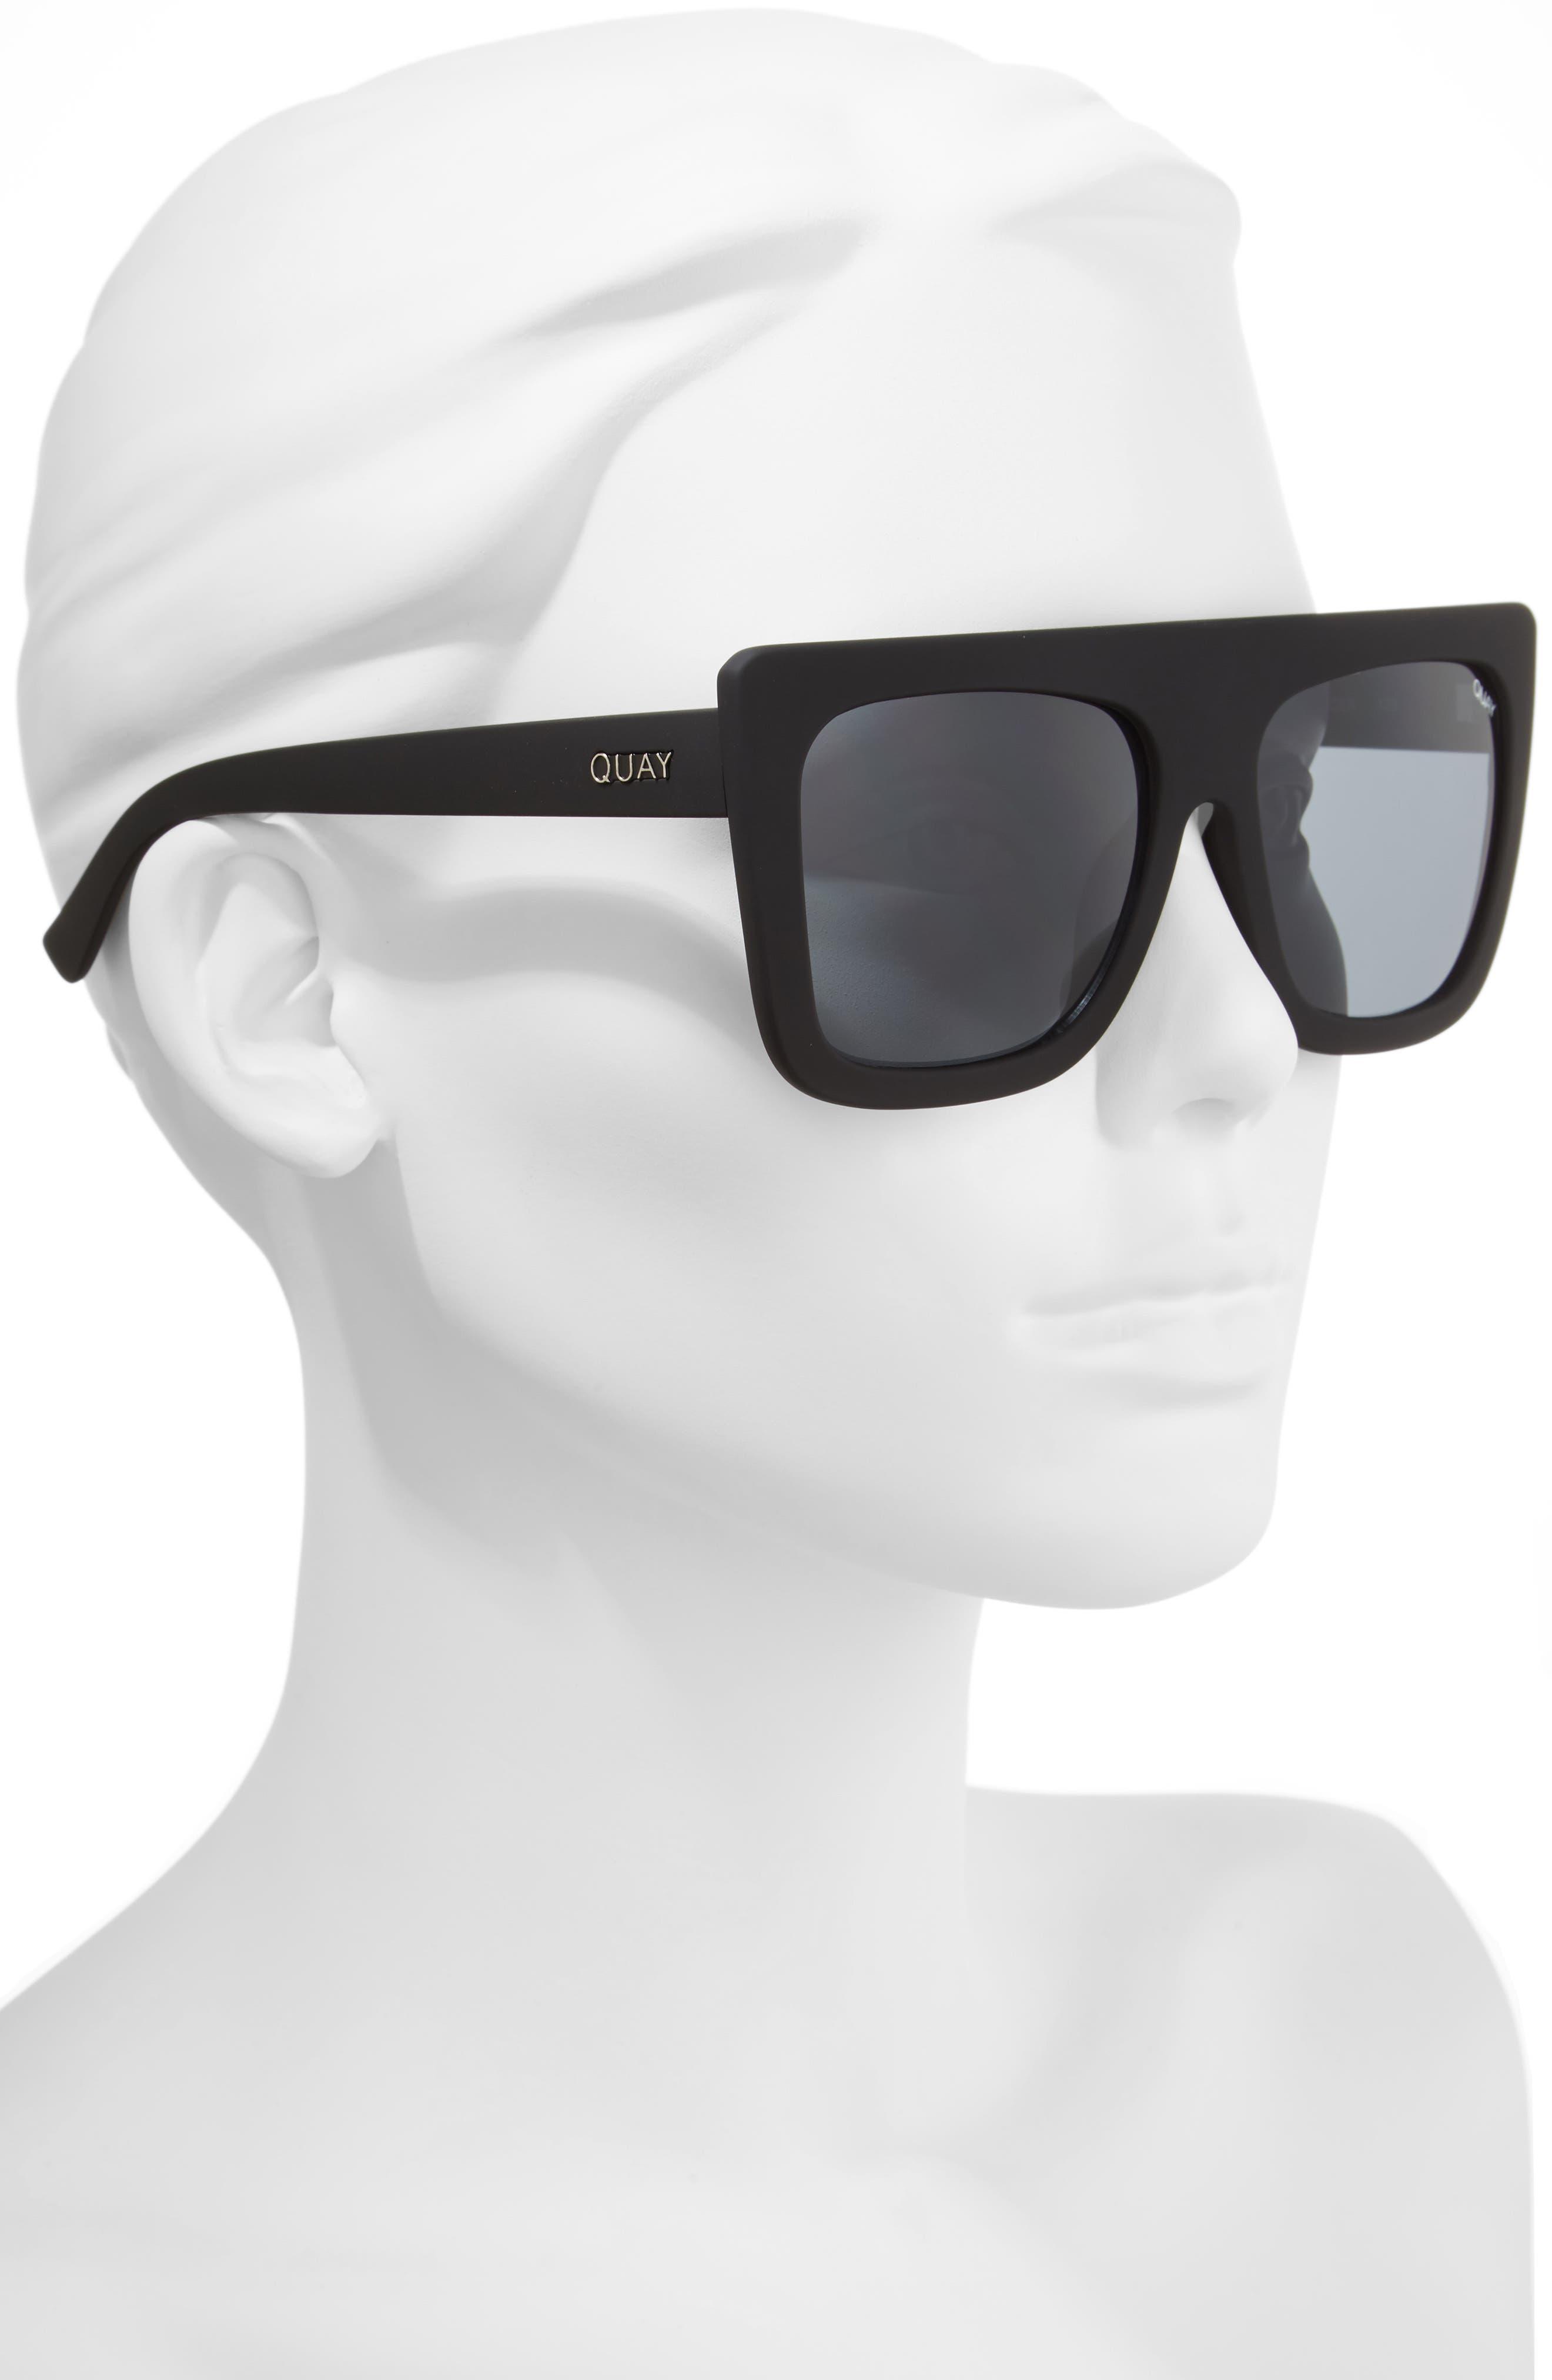 Cafe Racer 55mm Square Sunglasses,                             Alternate thumbnail 3, color,                             001